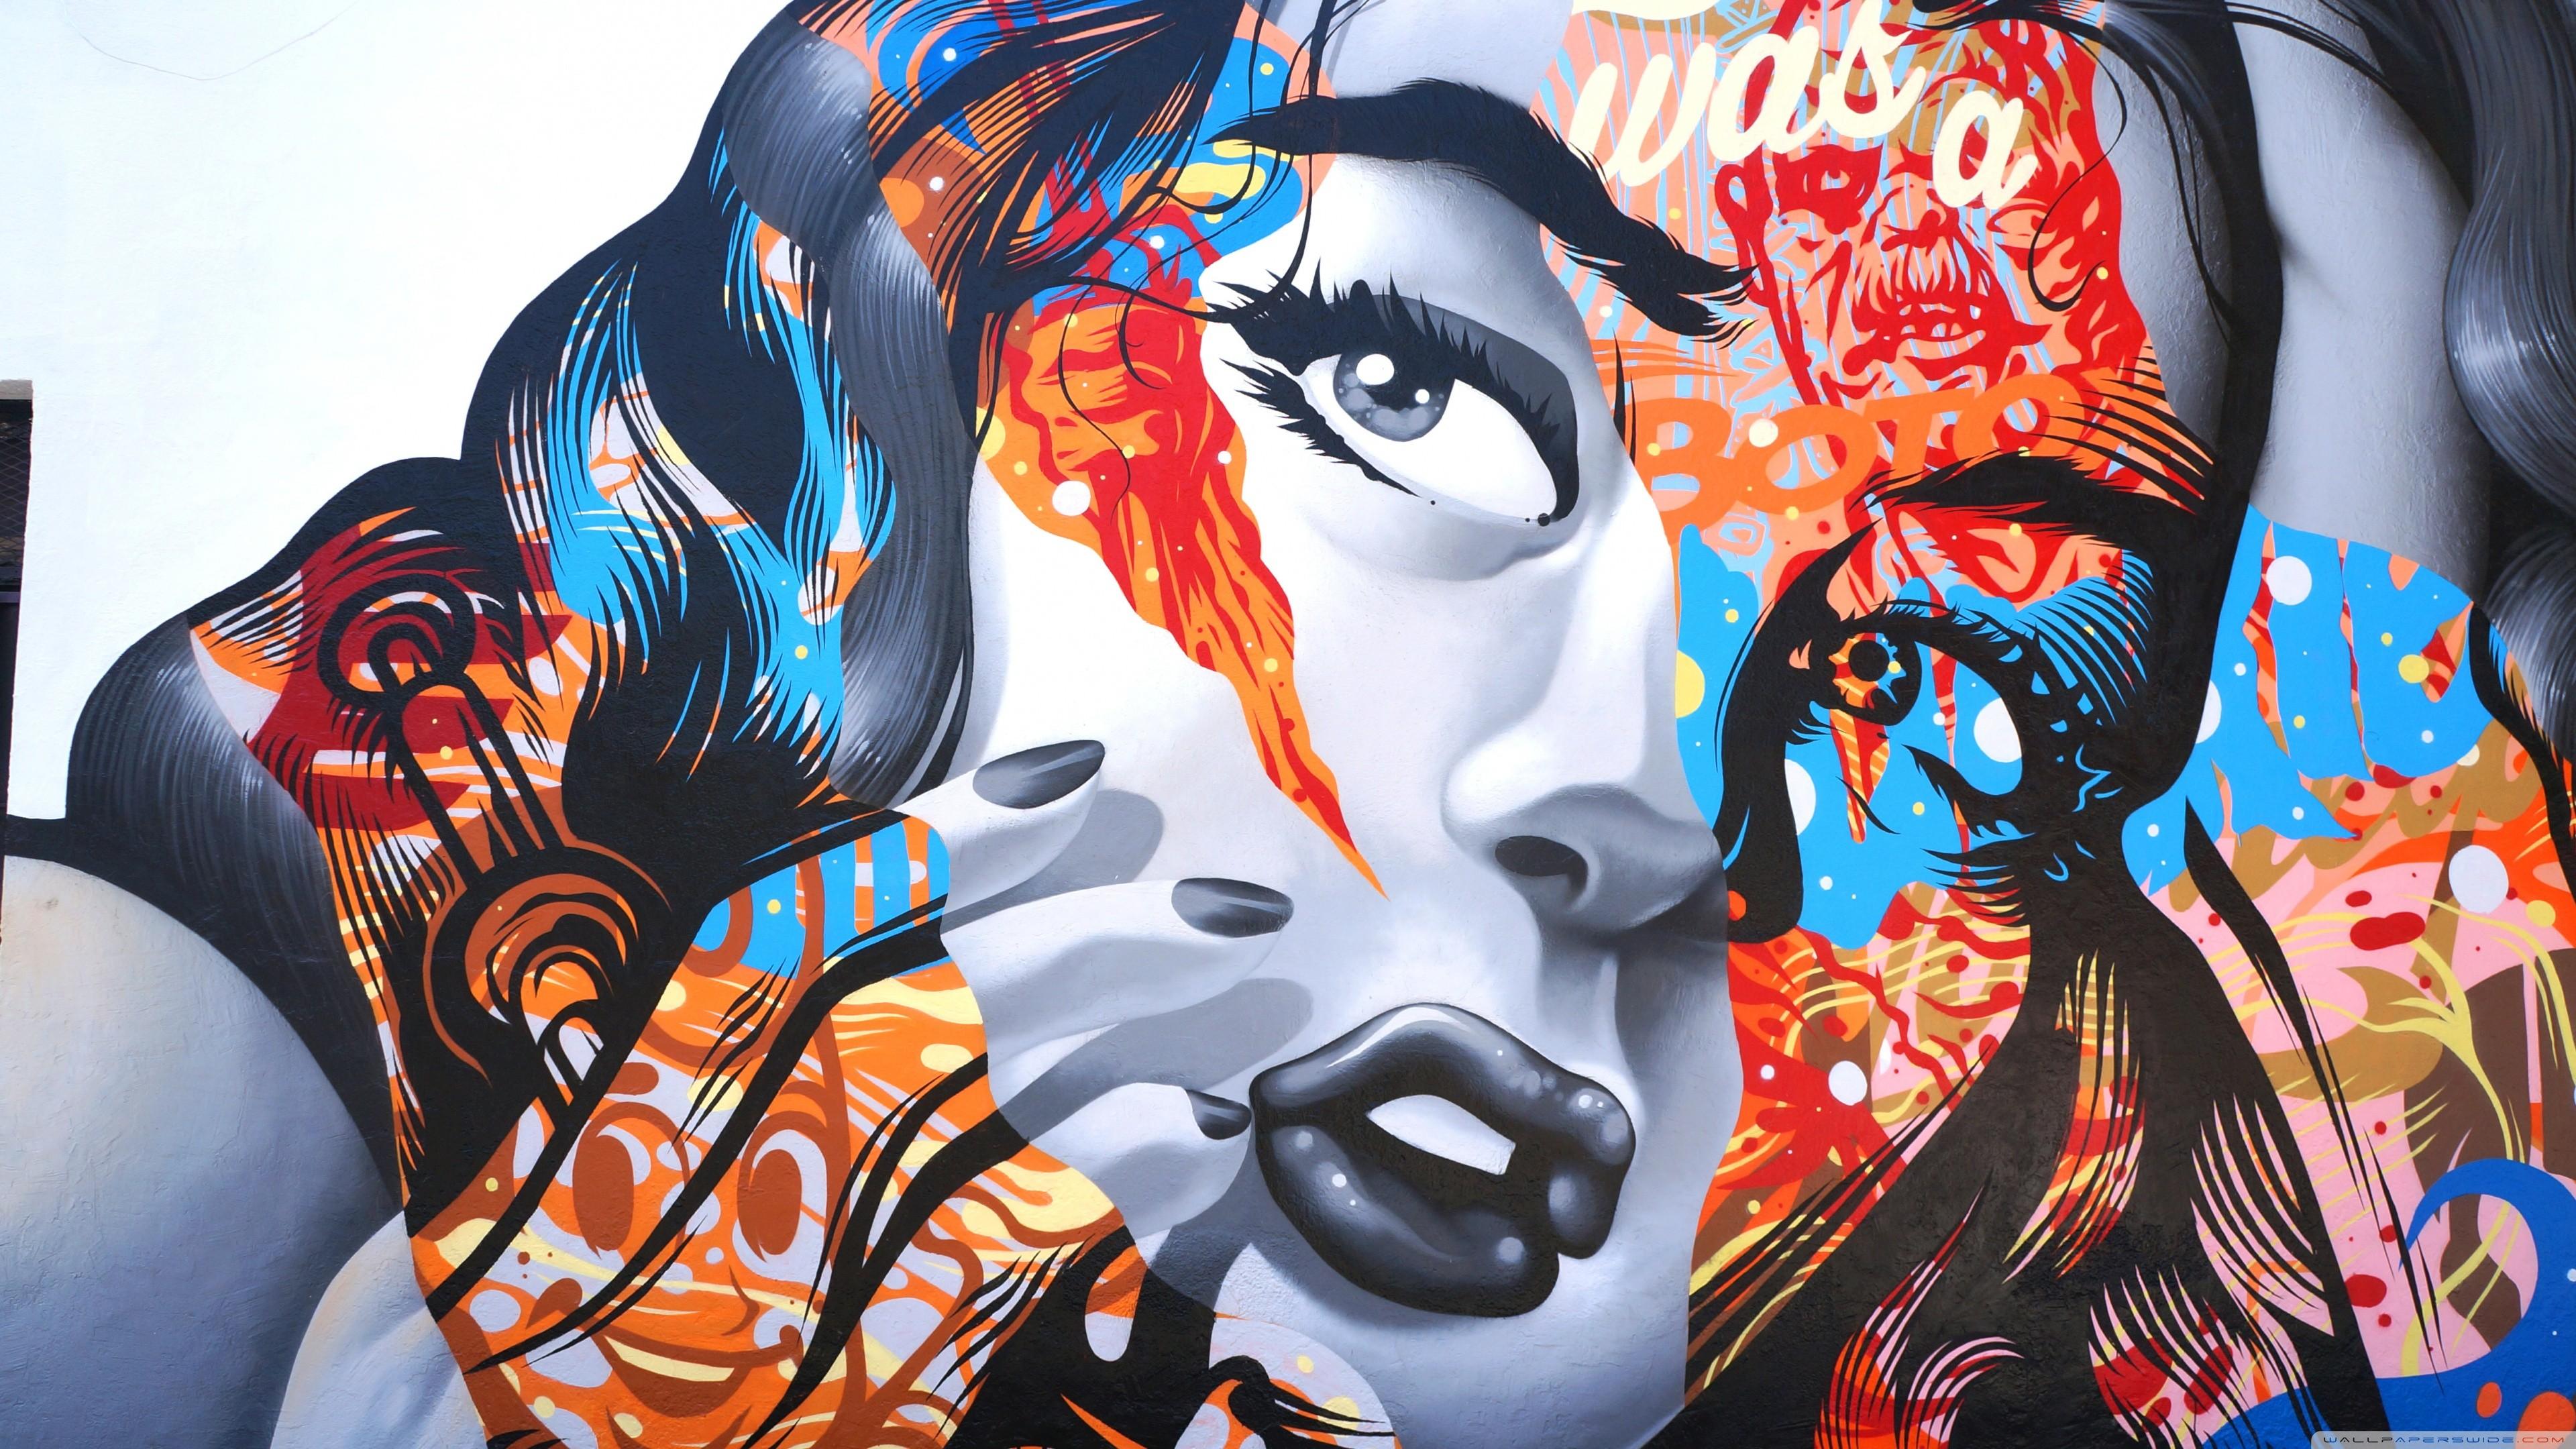 BioShock Infinite Graffiti 2048x1152 Resolution